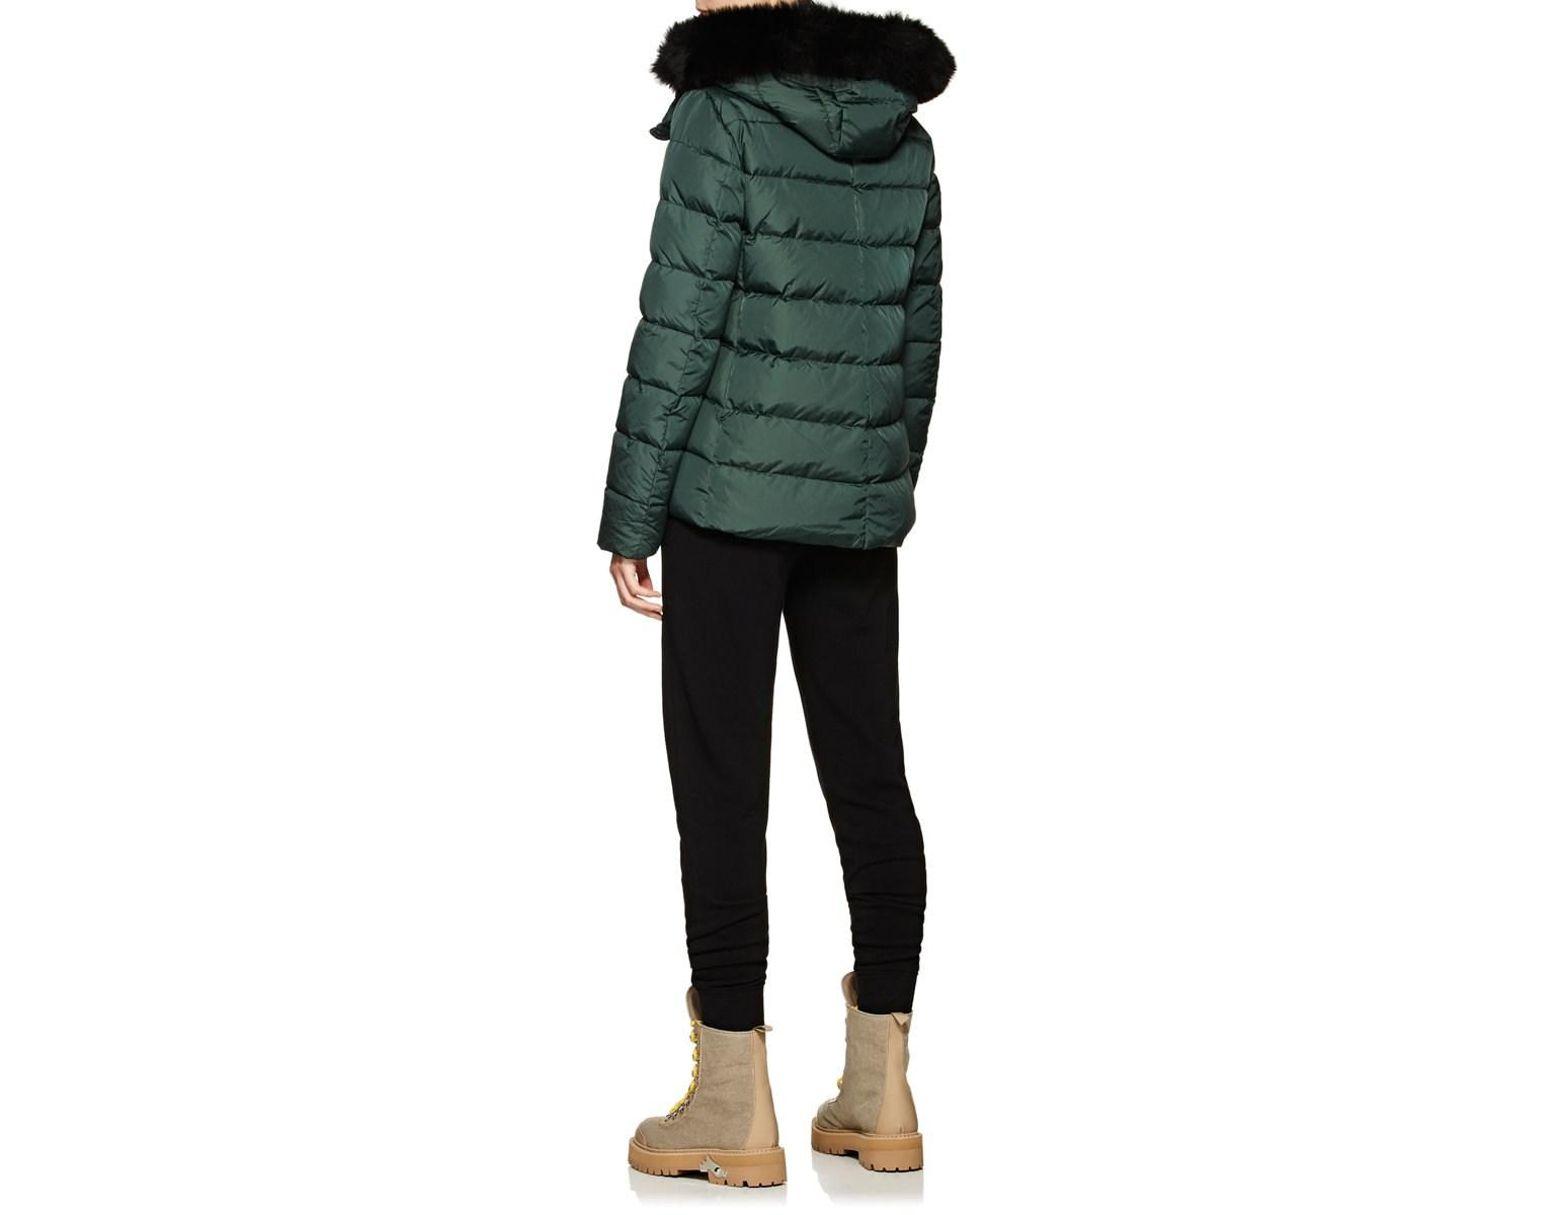 c4652bf92 Women's Green Fox-fur-trimmed Down Short Puffer Jacket